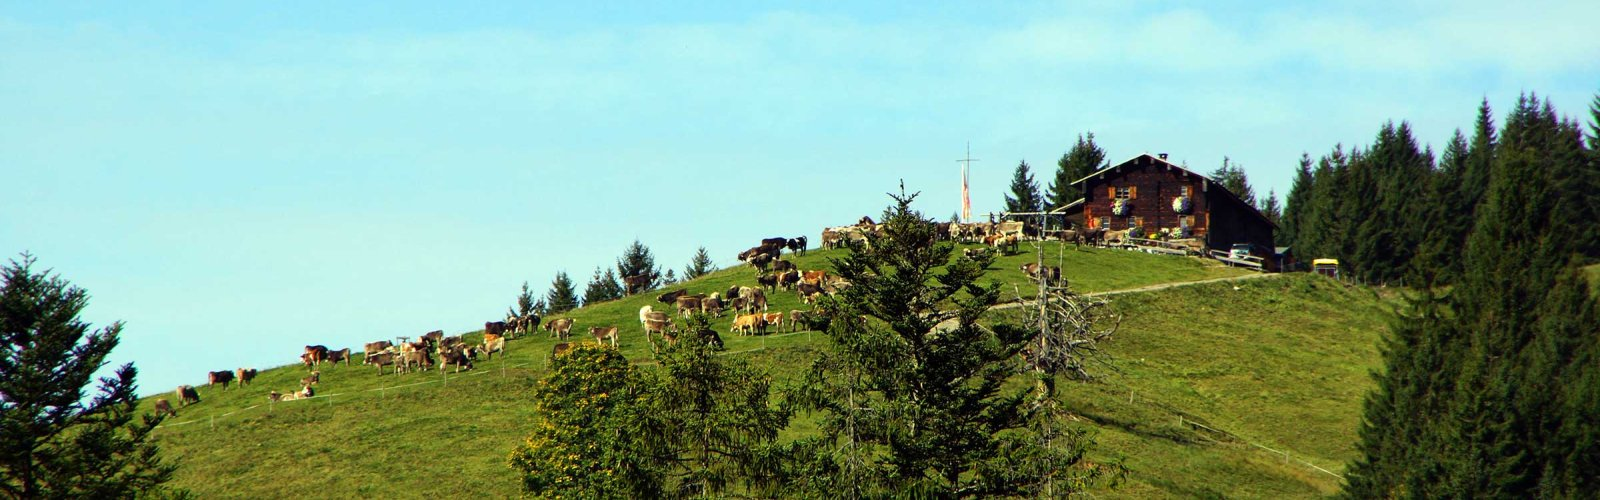 Hiesinger, Alpe Osterberg